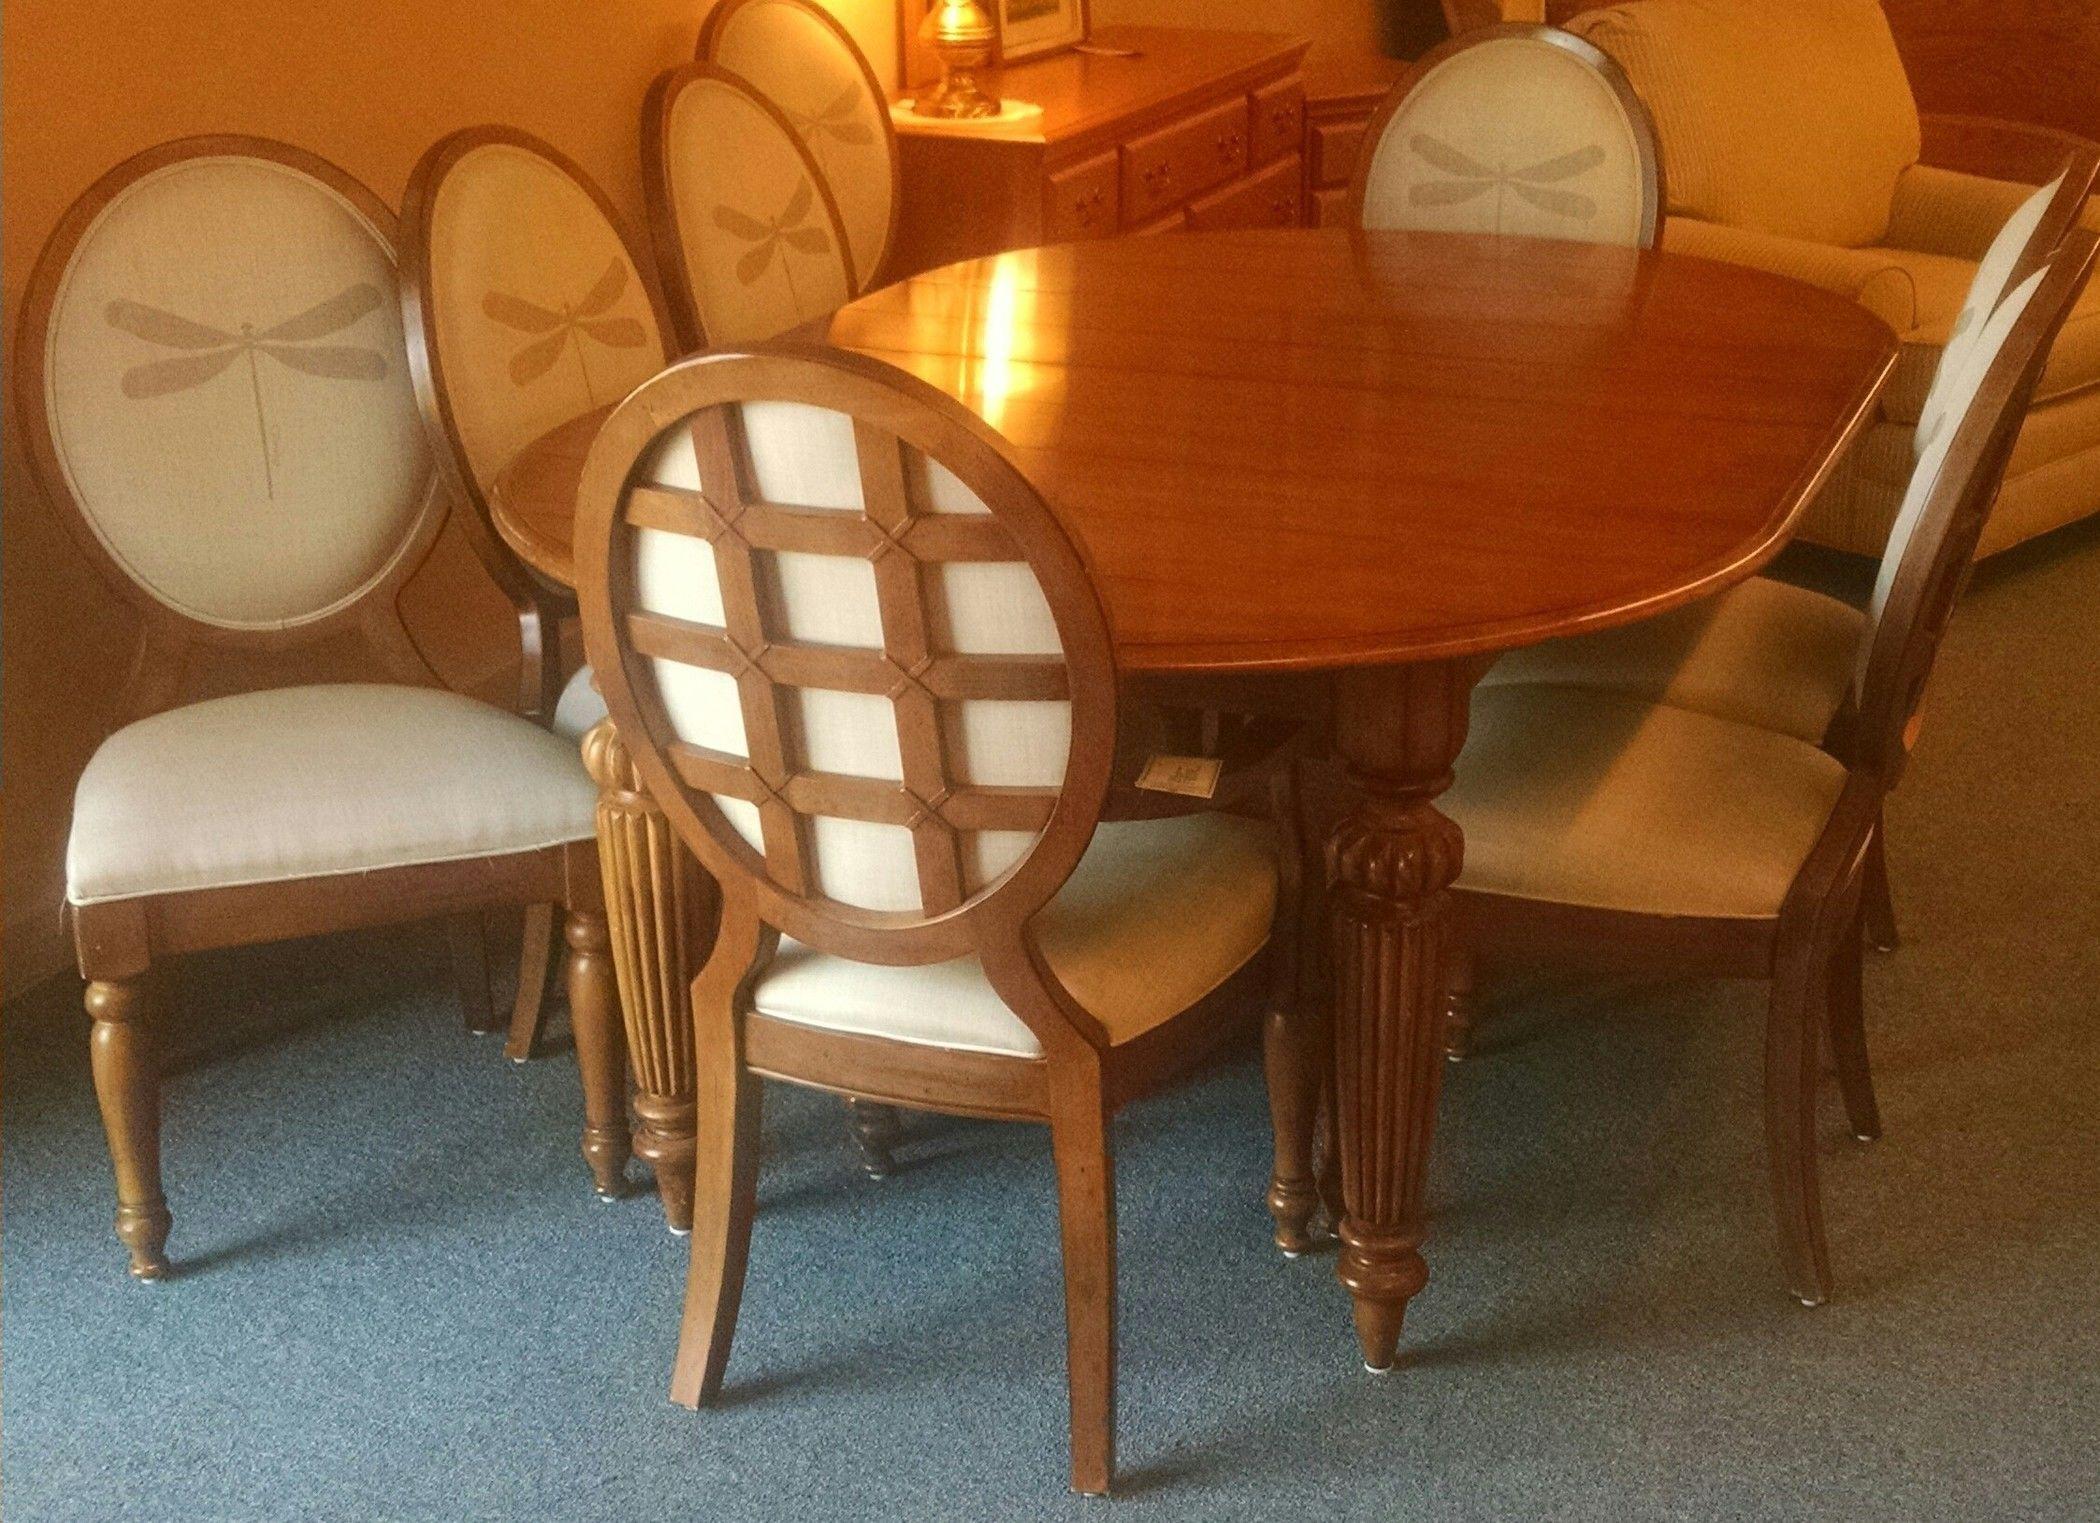 lexington dining room table   LEXINGTON DINING ROOM TABLE   Delmarva Furniture Consignment